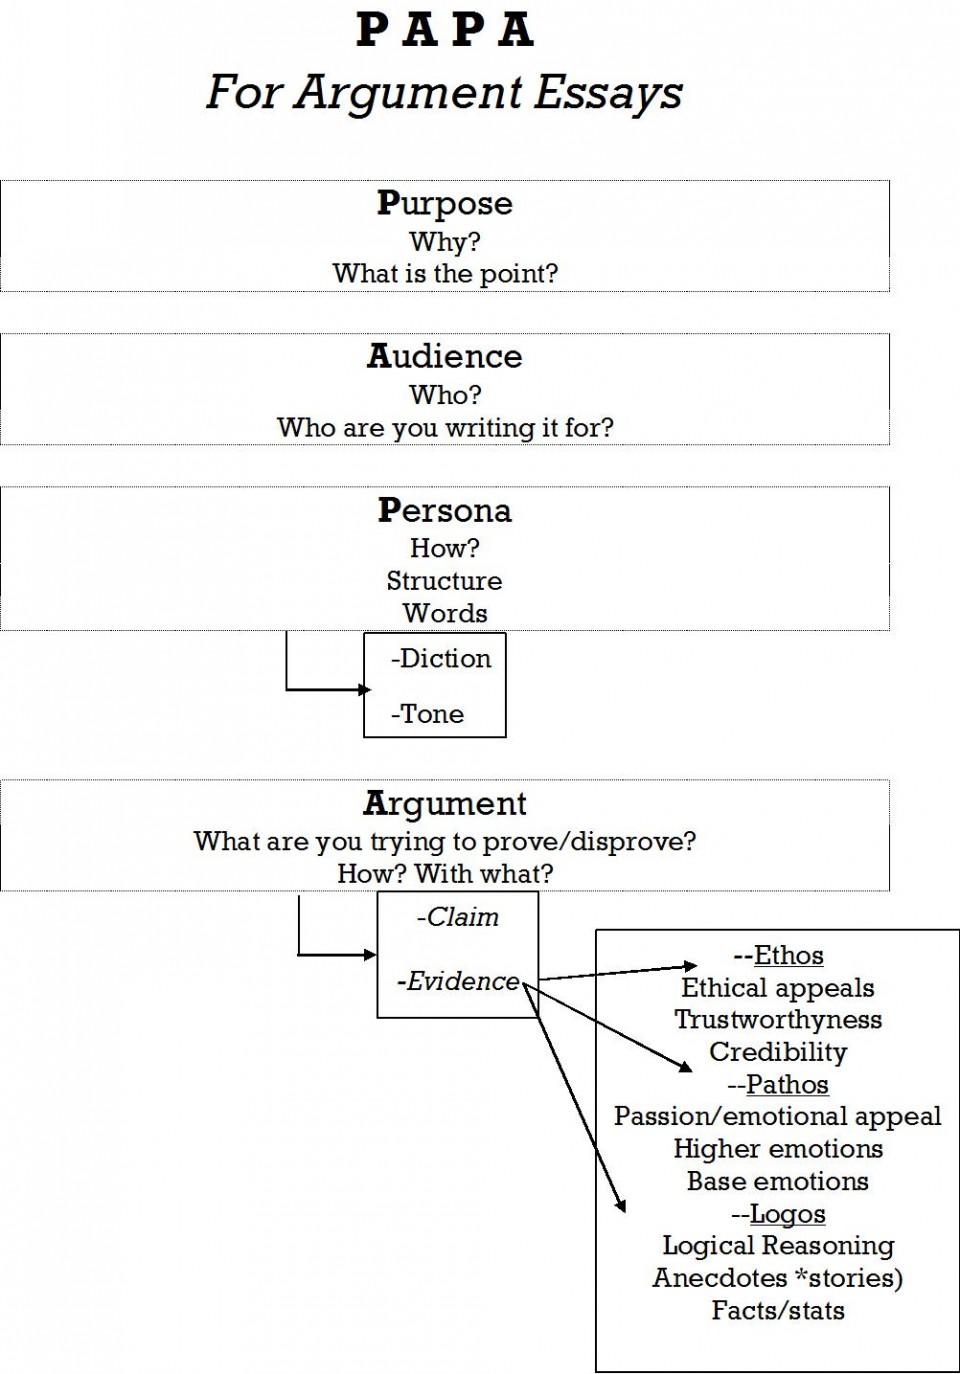 013 Essay Example Papa Jpg Parts Of Singular Argumentative An Quiz Middle School Evidence 960